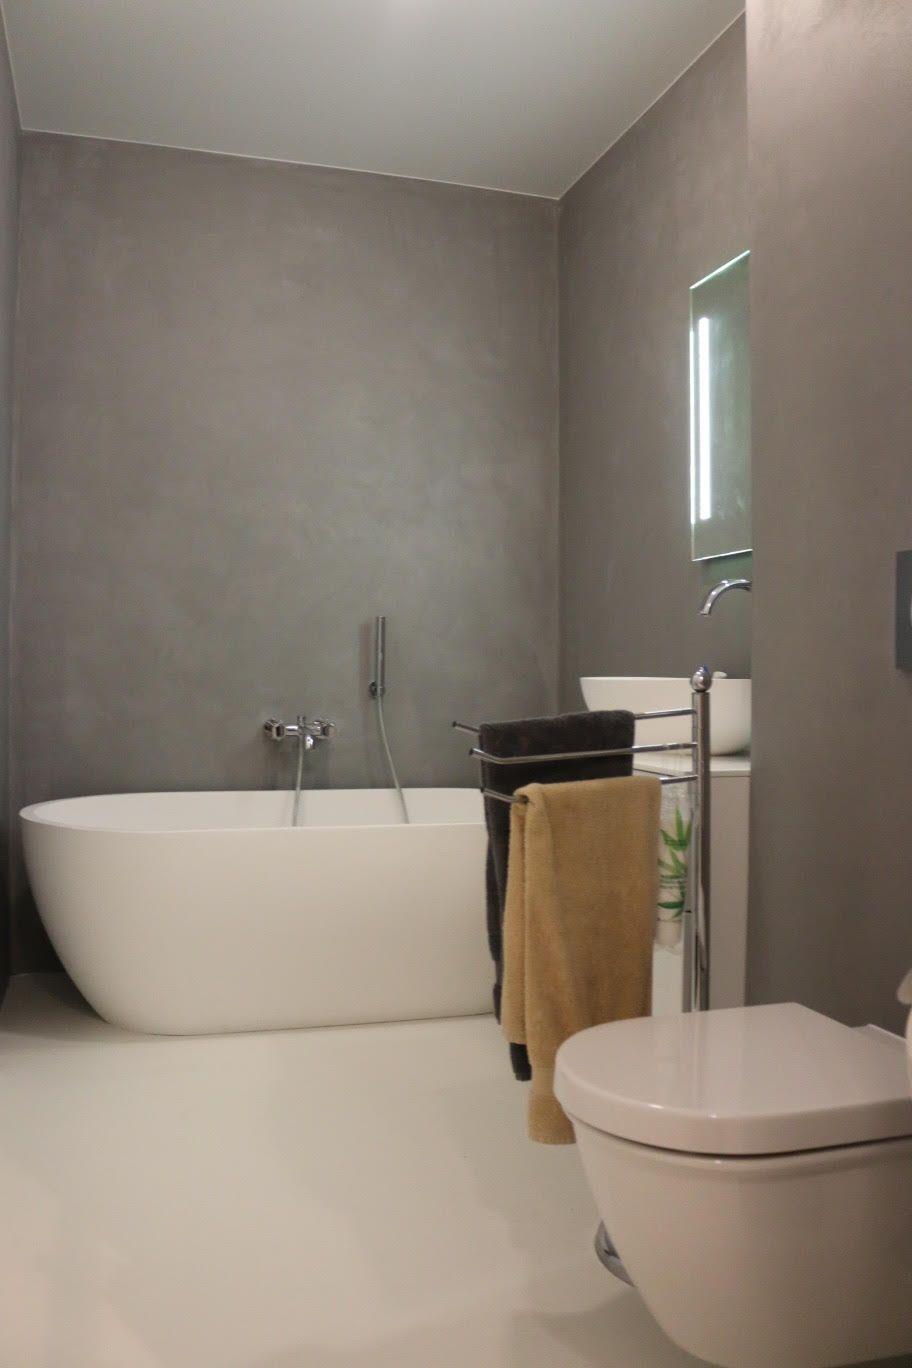 Mur en béton Gris Eléphant  Salle de bain en béton, Salle de bain